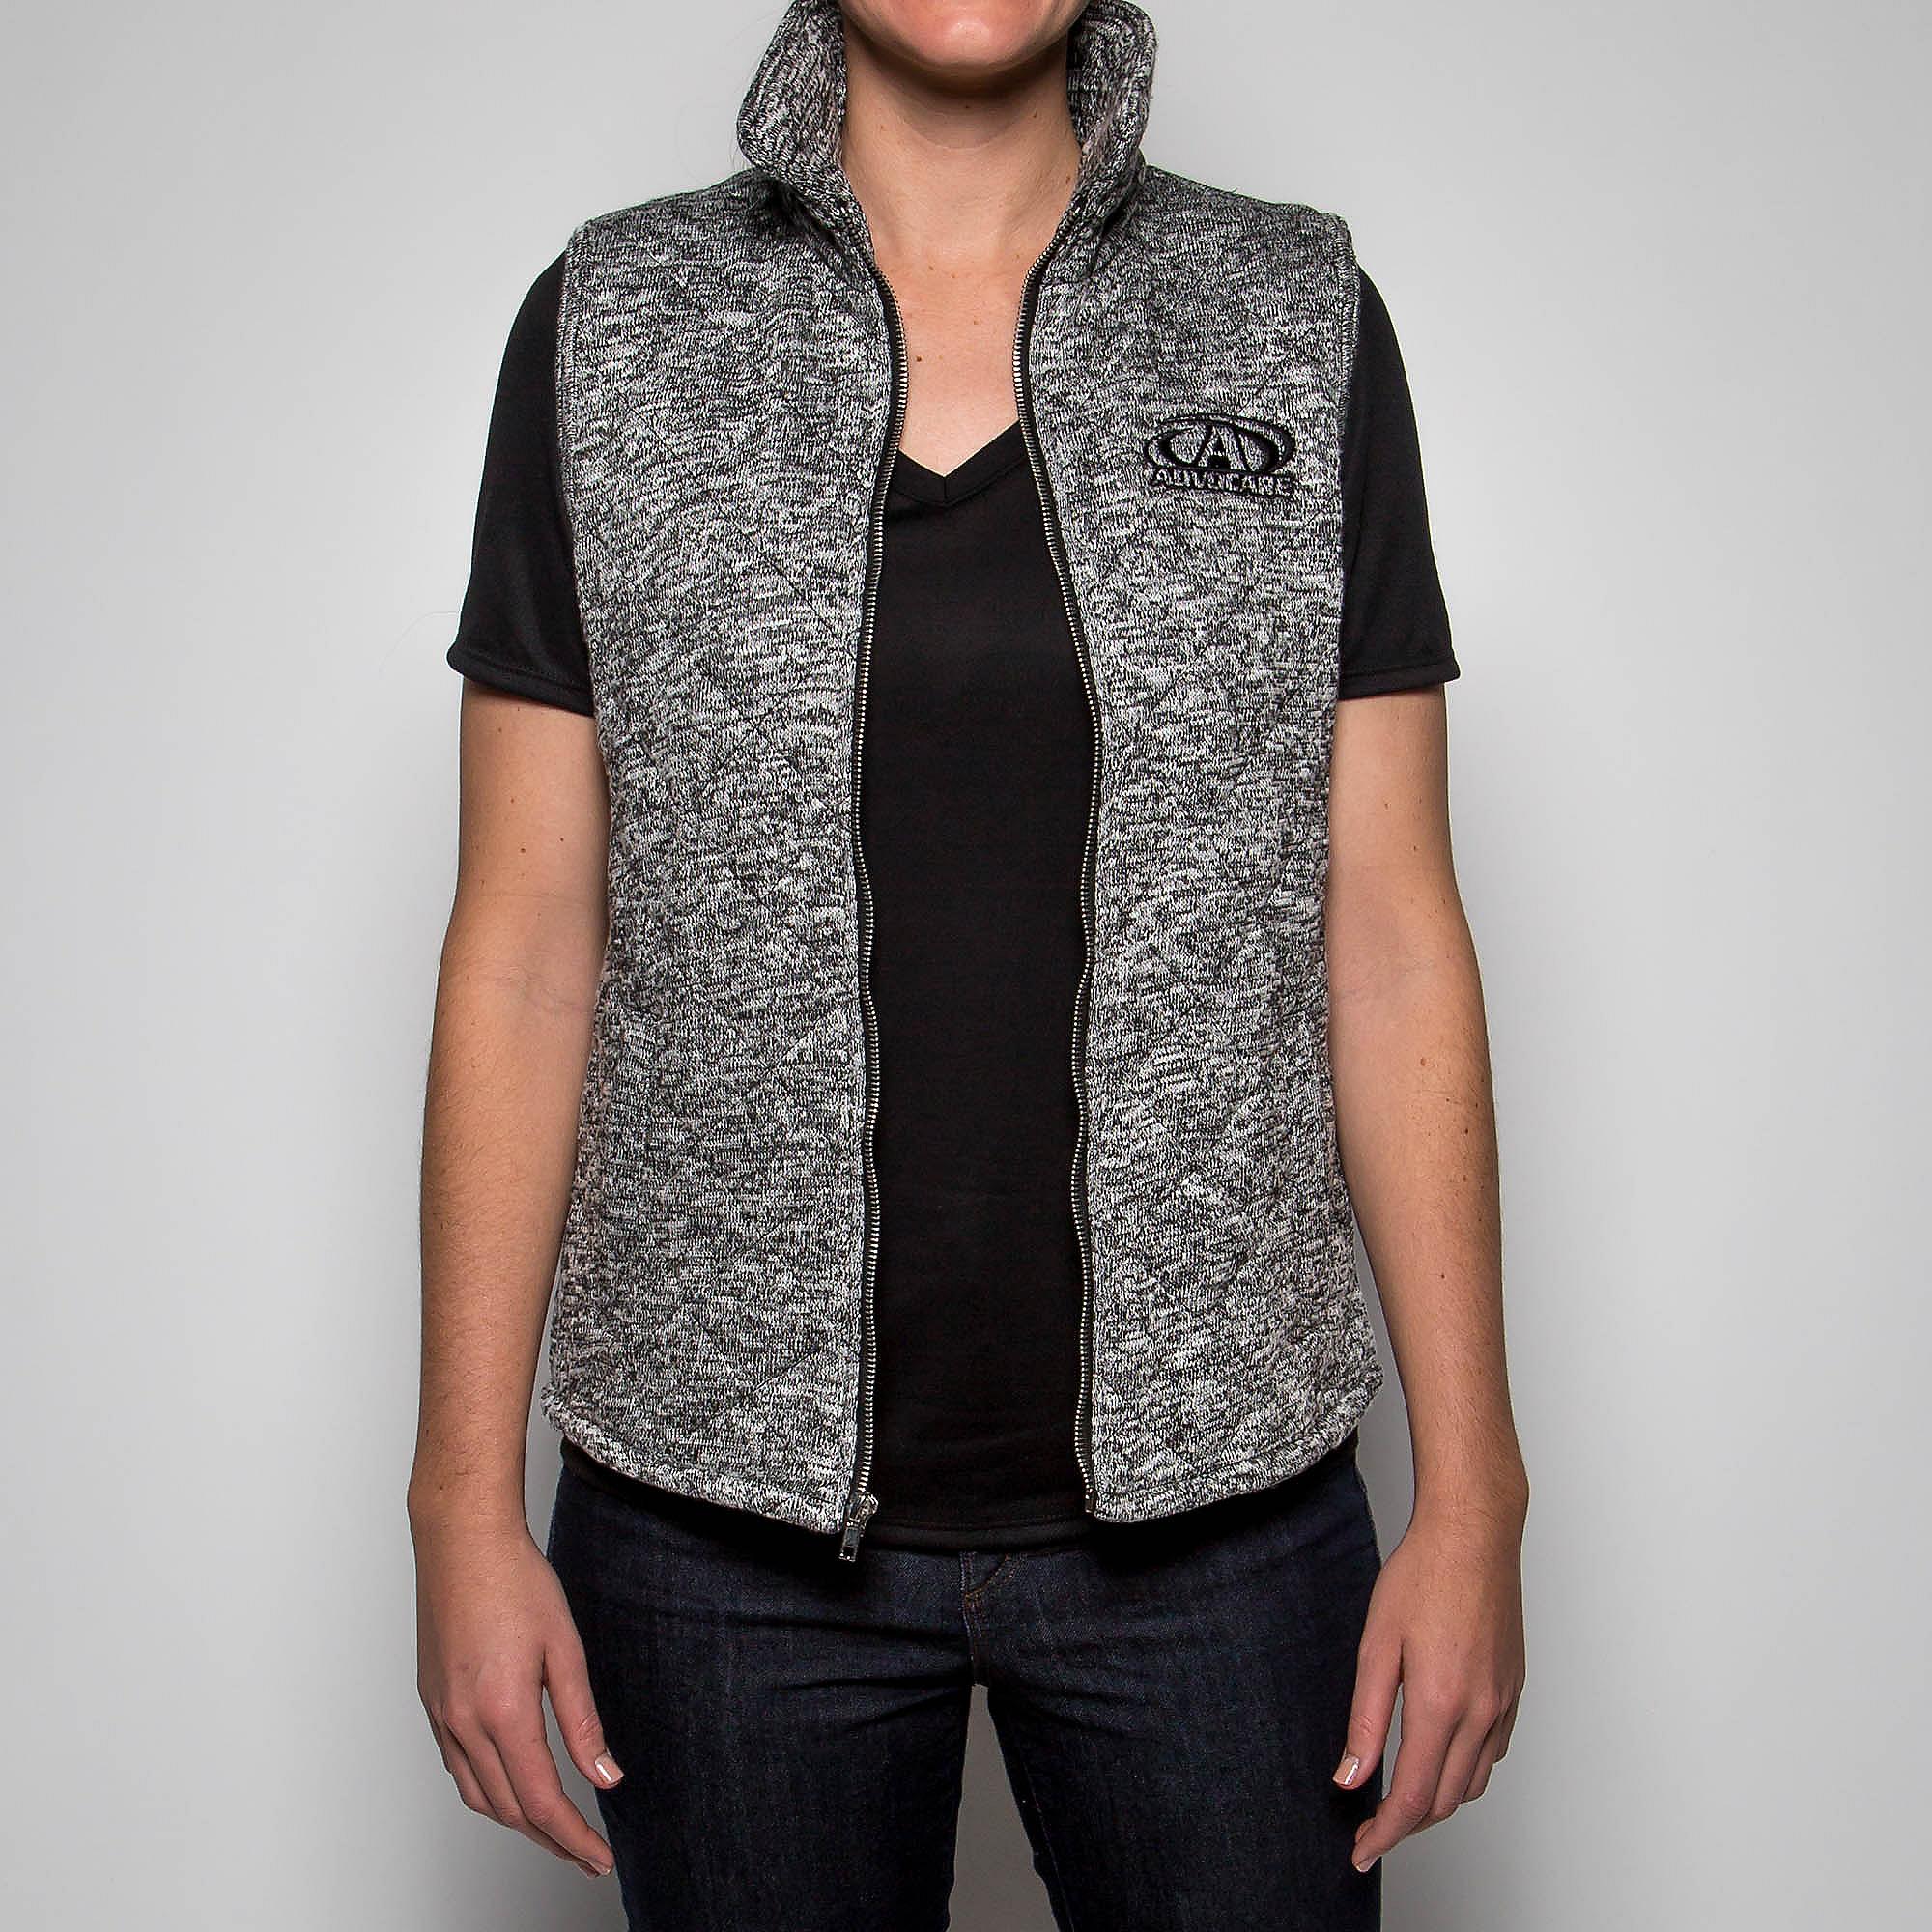 AdvoCare Ladies Fashion Vest